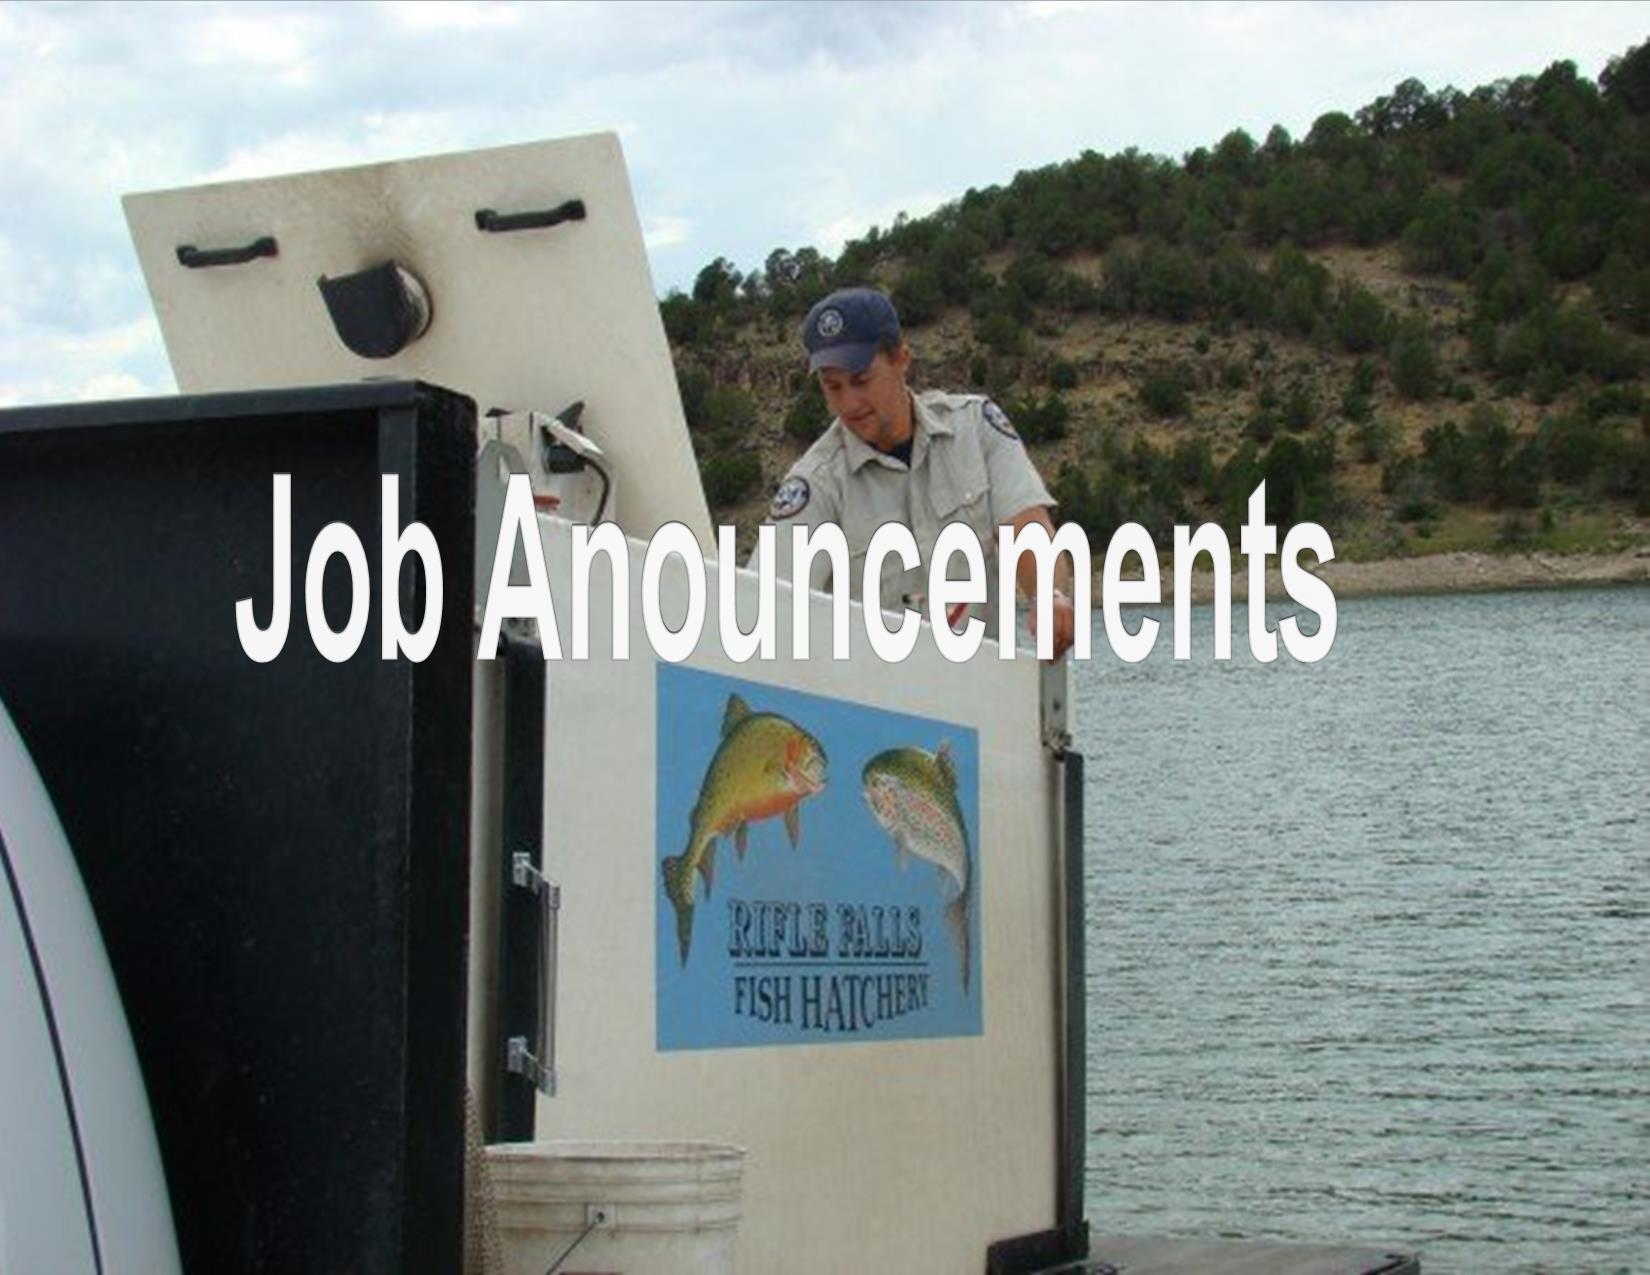 Fish Hatchery Technician Stocking, Jason Fearheiley, stocking fish. Division of Wildlife,7/15/2008